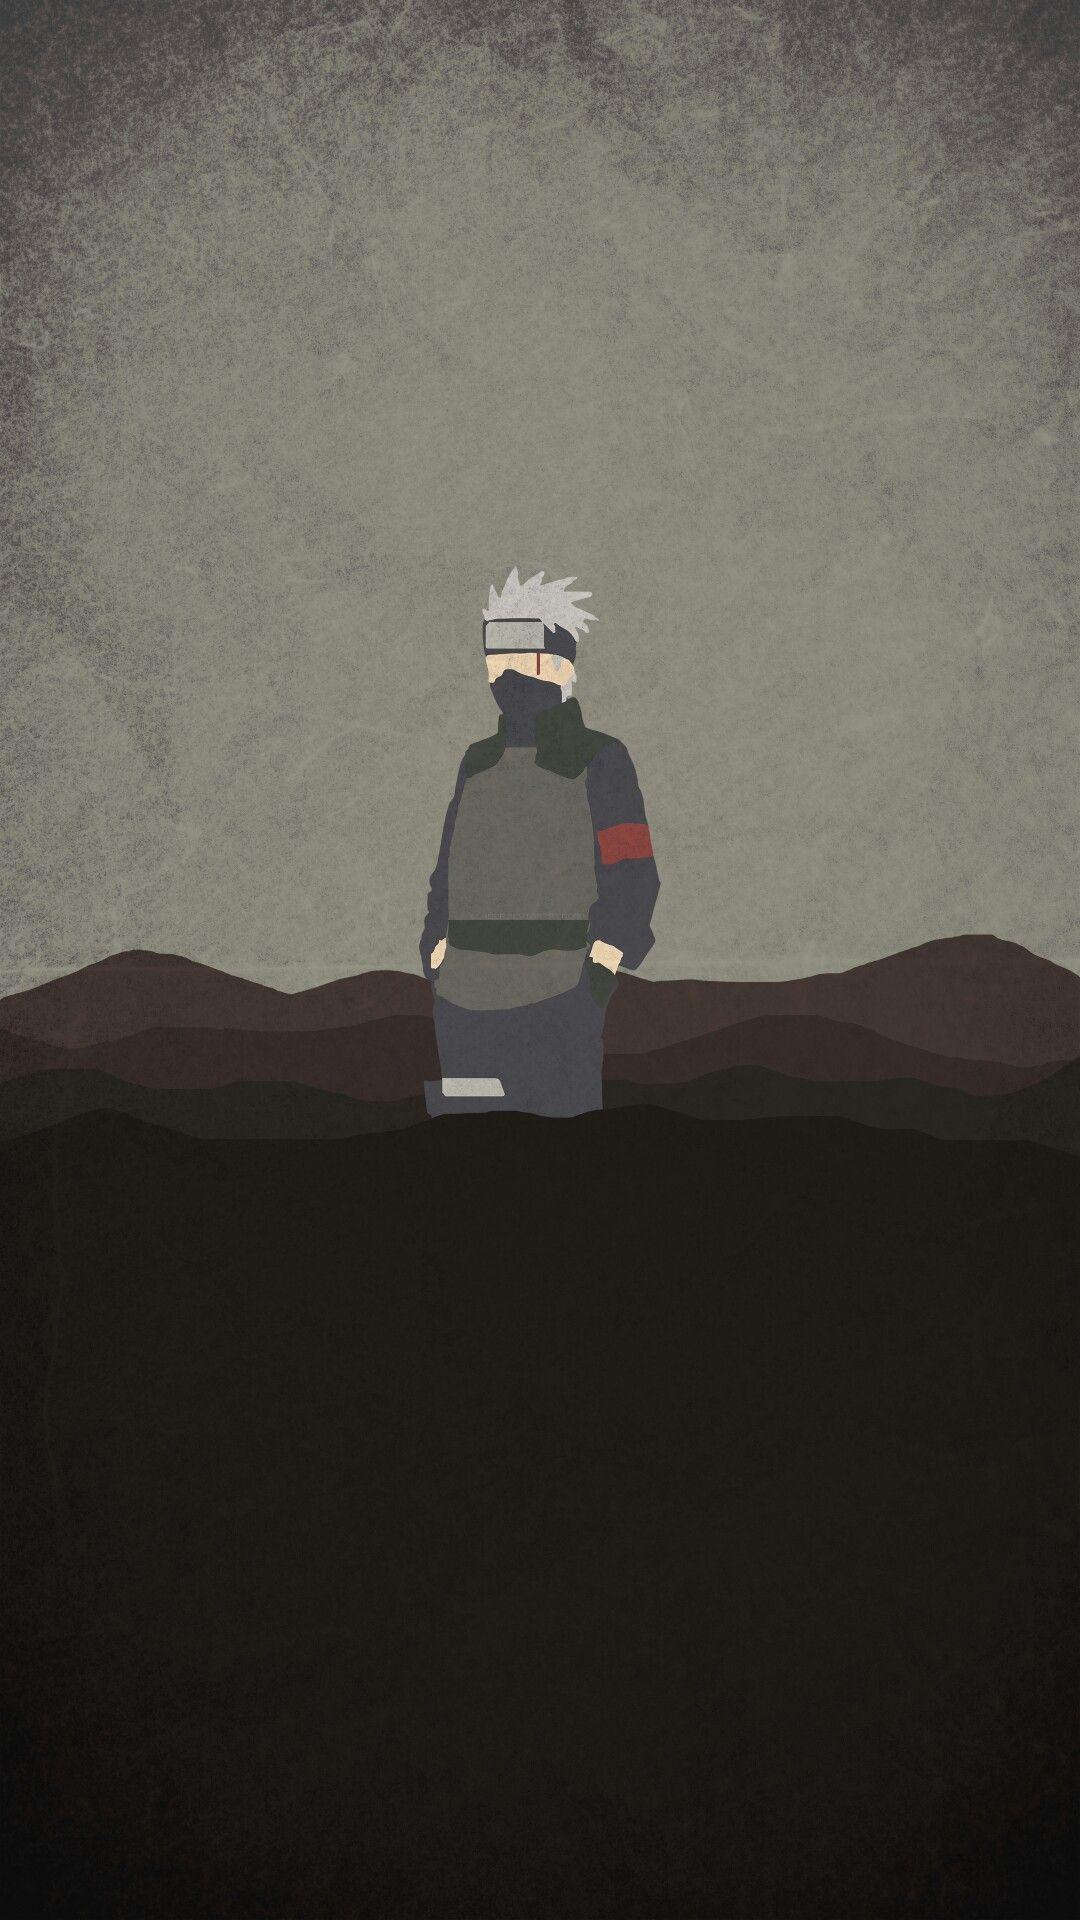 Minimalist Aesthetic Naruto Desktop Wallpaper